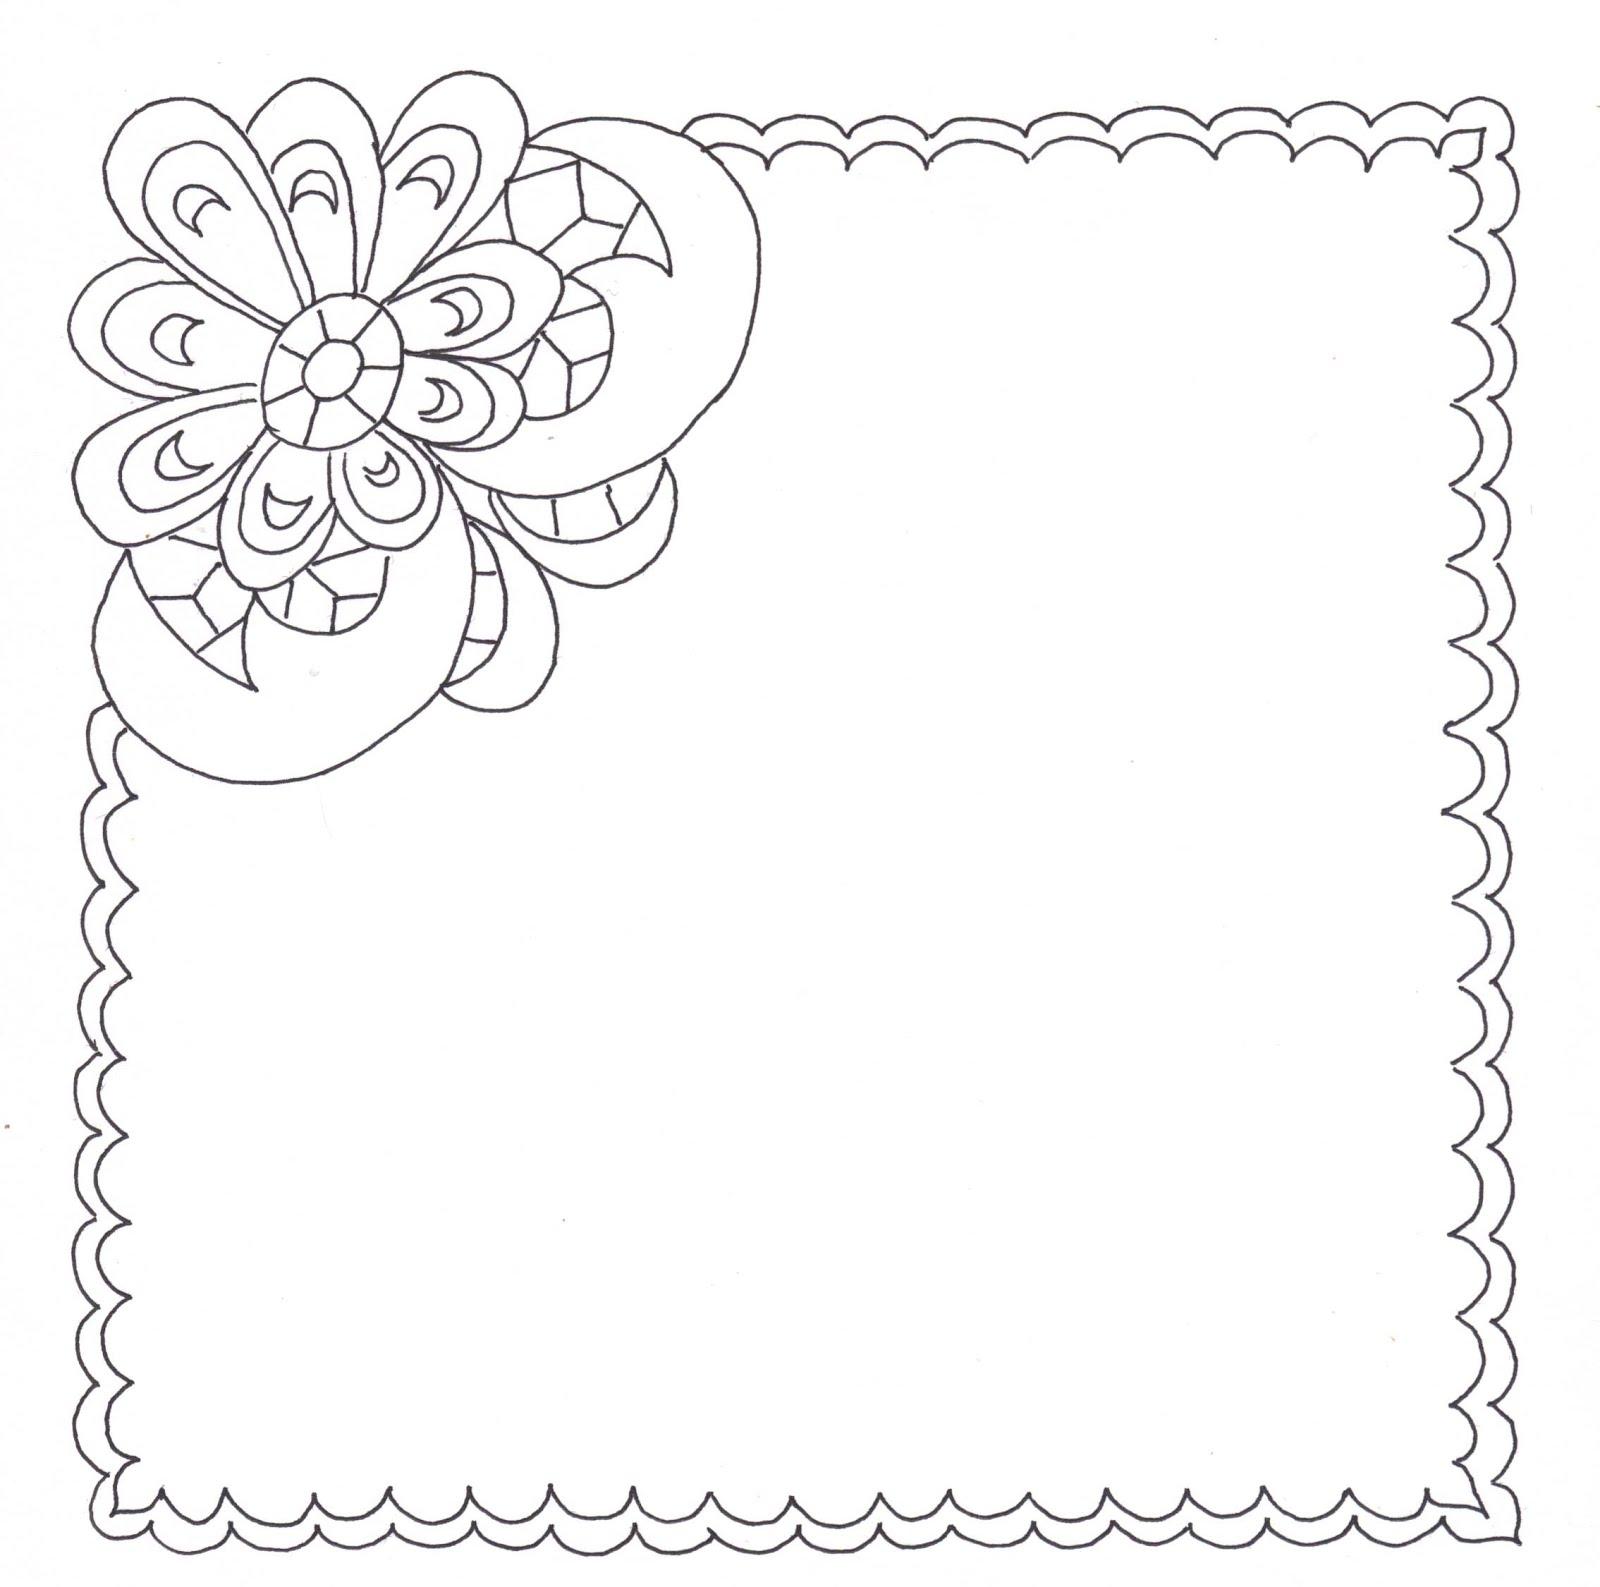 платок бабушке раскраска